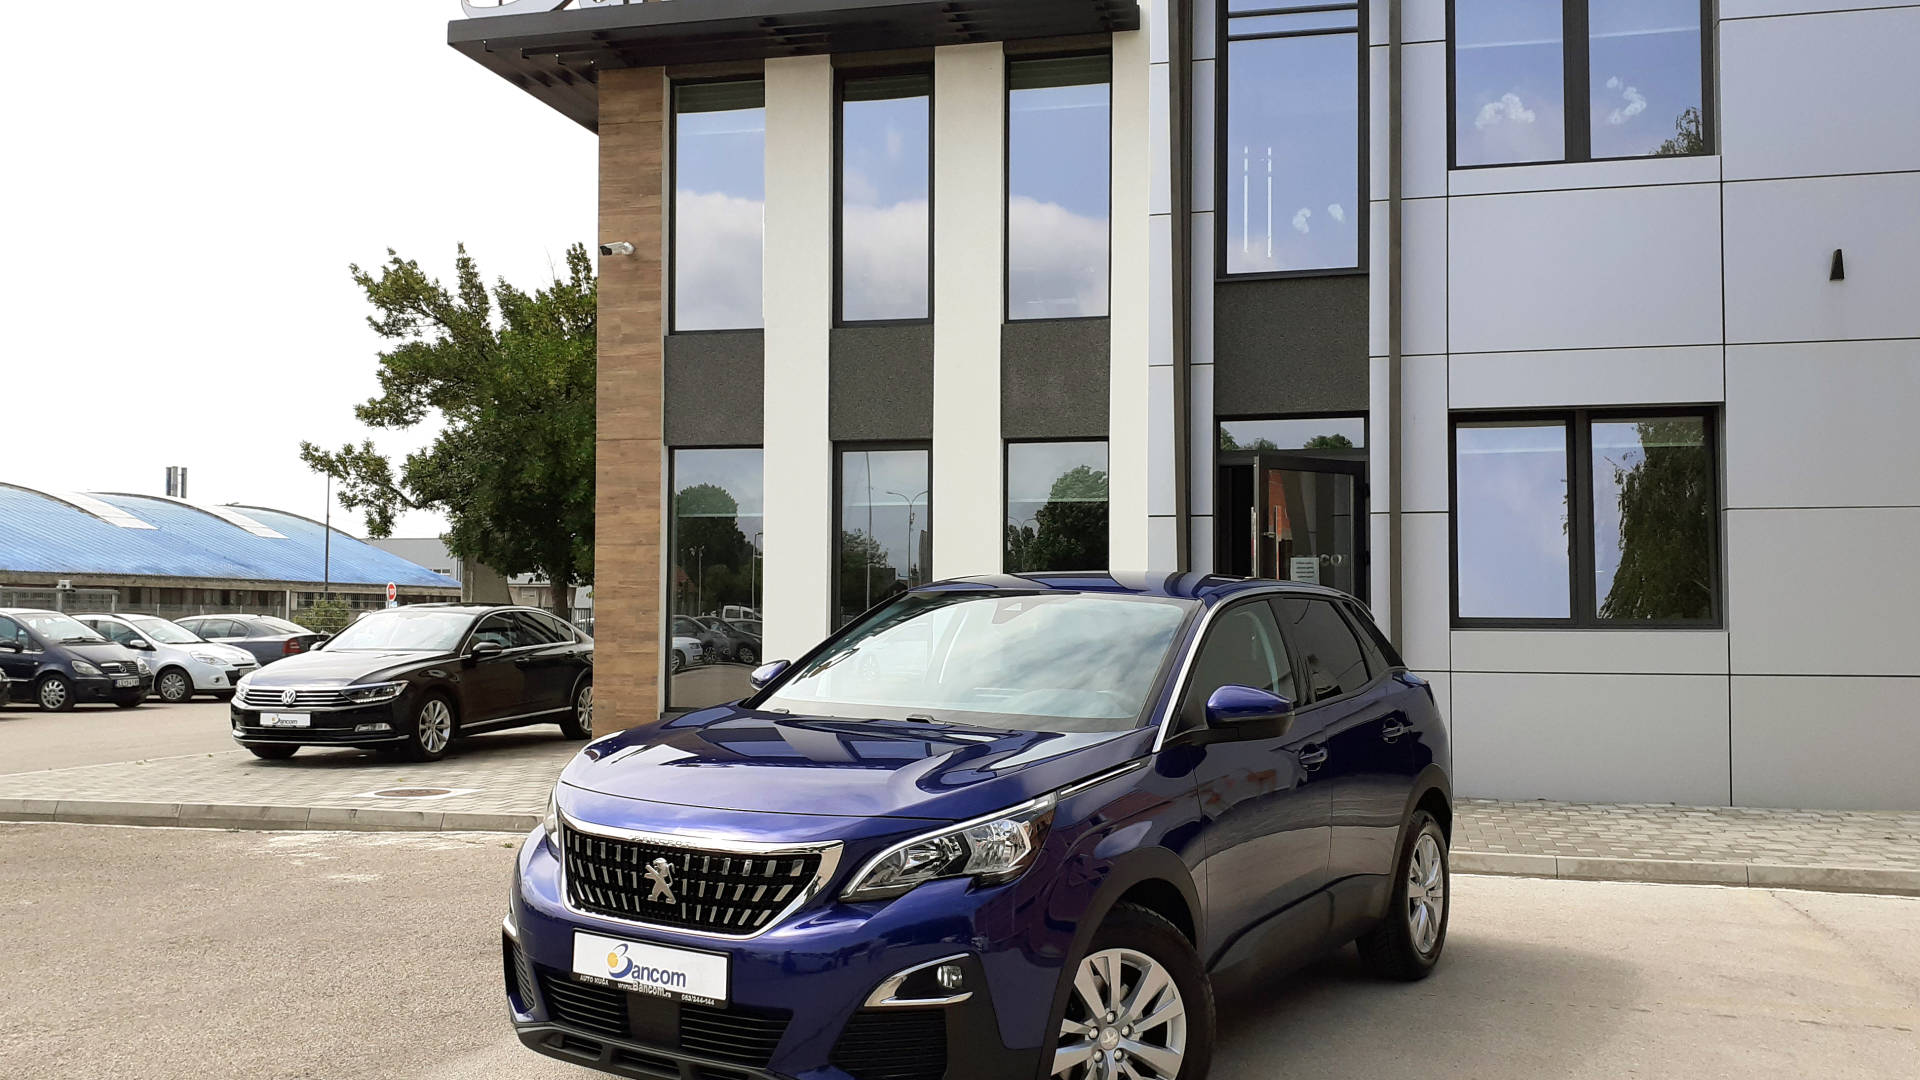 Fotografija za 2059 Peugeot 3008 1.6BlueHDI Active Business